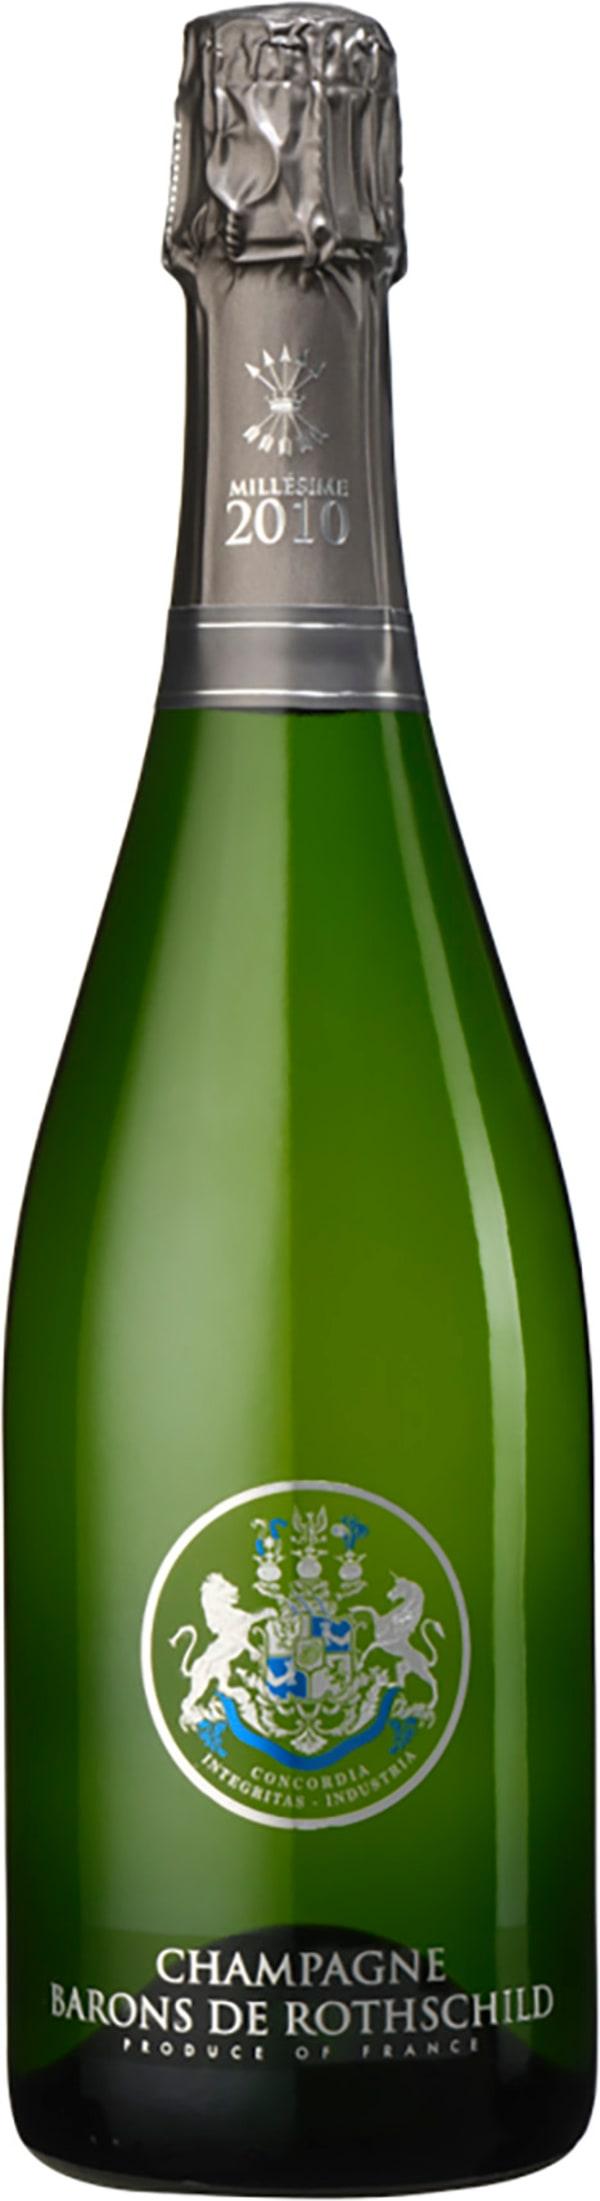 Champagne Barons de Rothschild Brut Millésime 2010